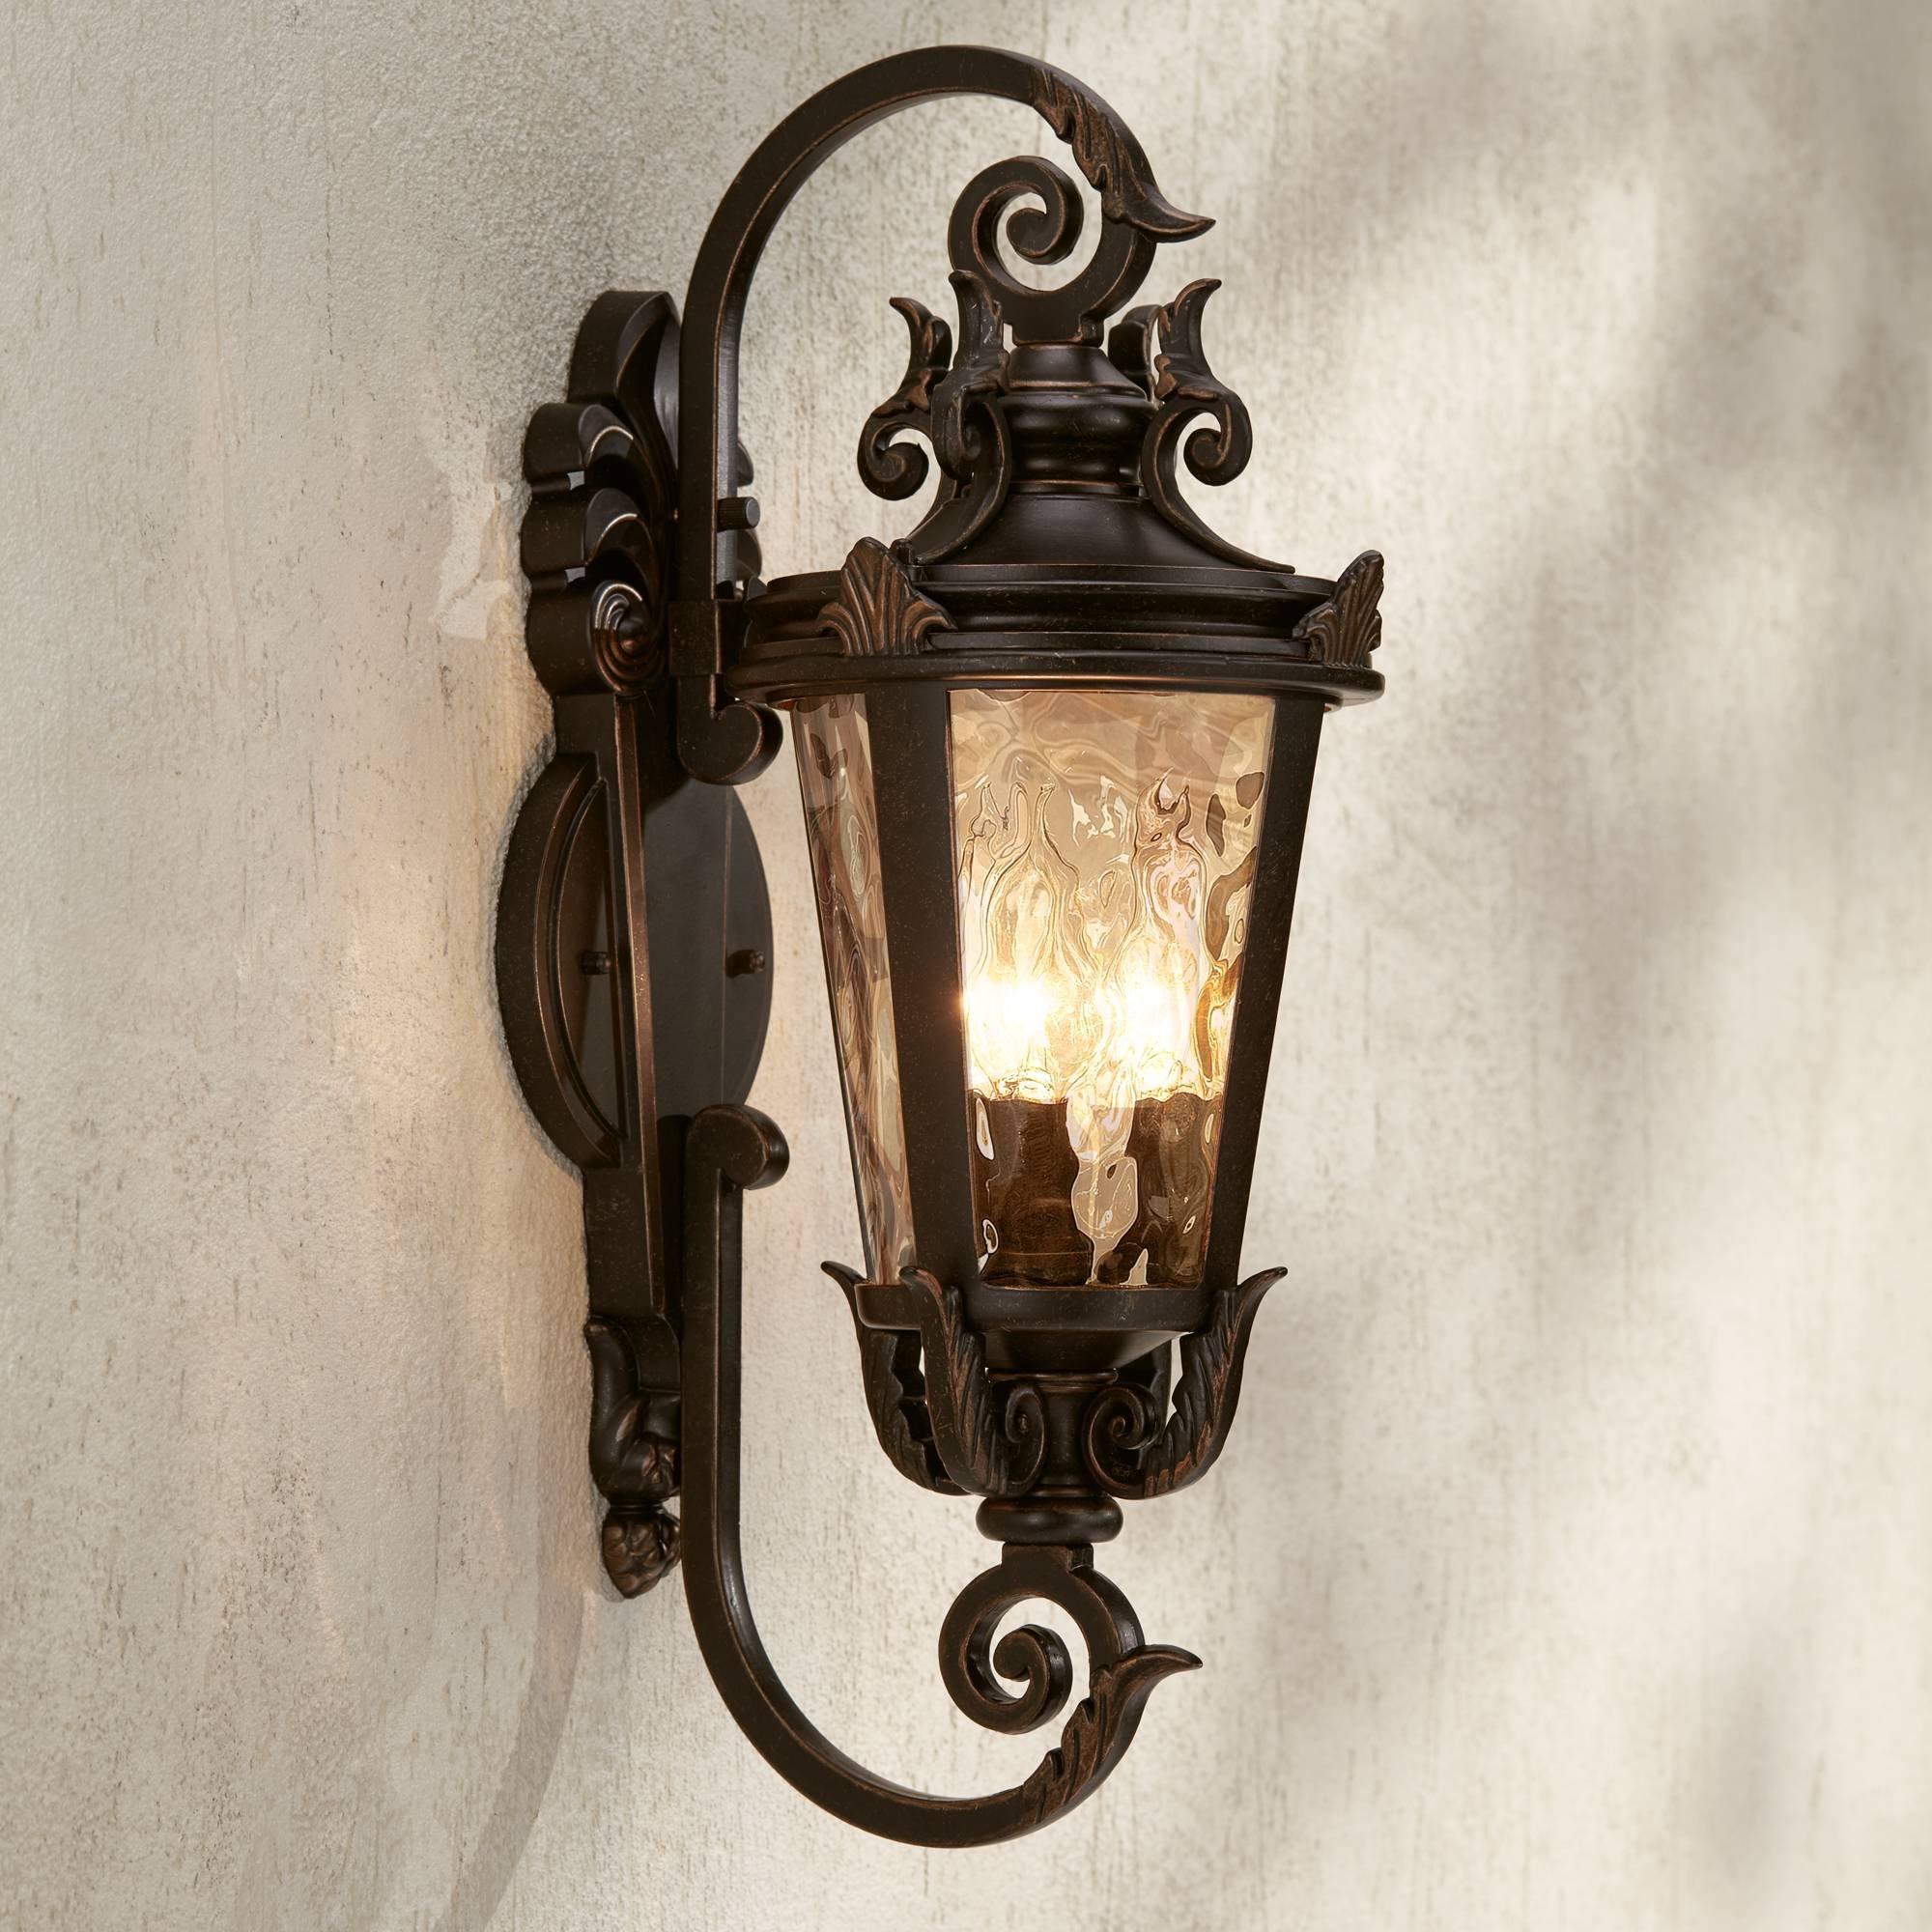 Casa Marseille Outdoor Wall Light Fixture Bronze Scroll 21 1/2'' Hammered Glass for House Porch Patio - John Timberland